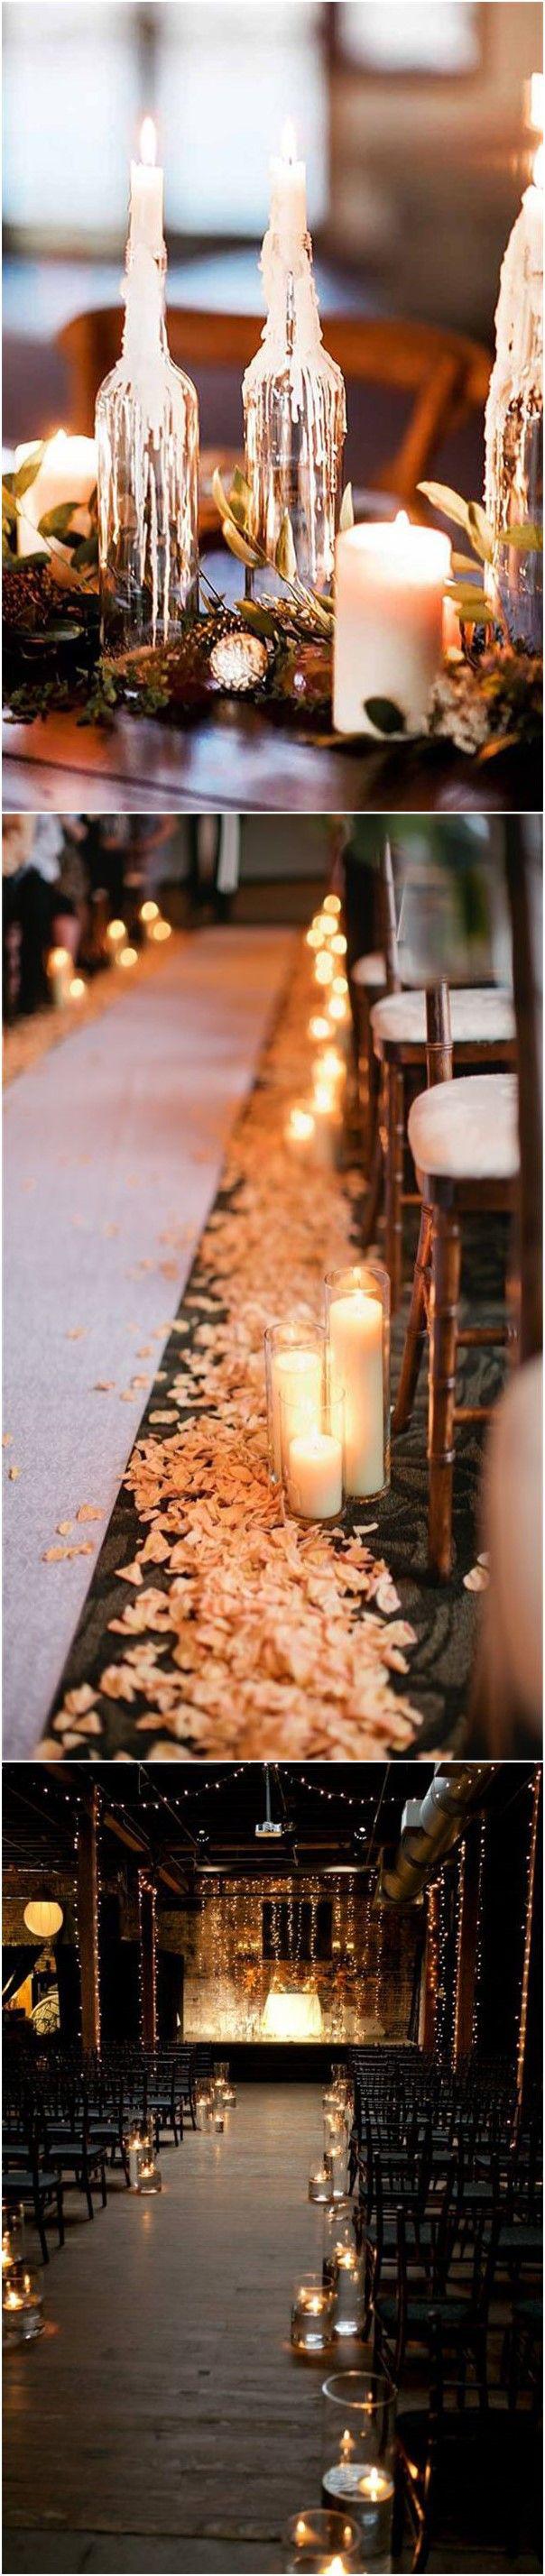 Pin by Maria Bednarova on Wedding  Pinterest  DIY wedding Wedding